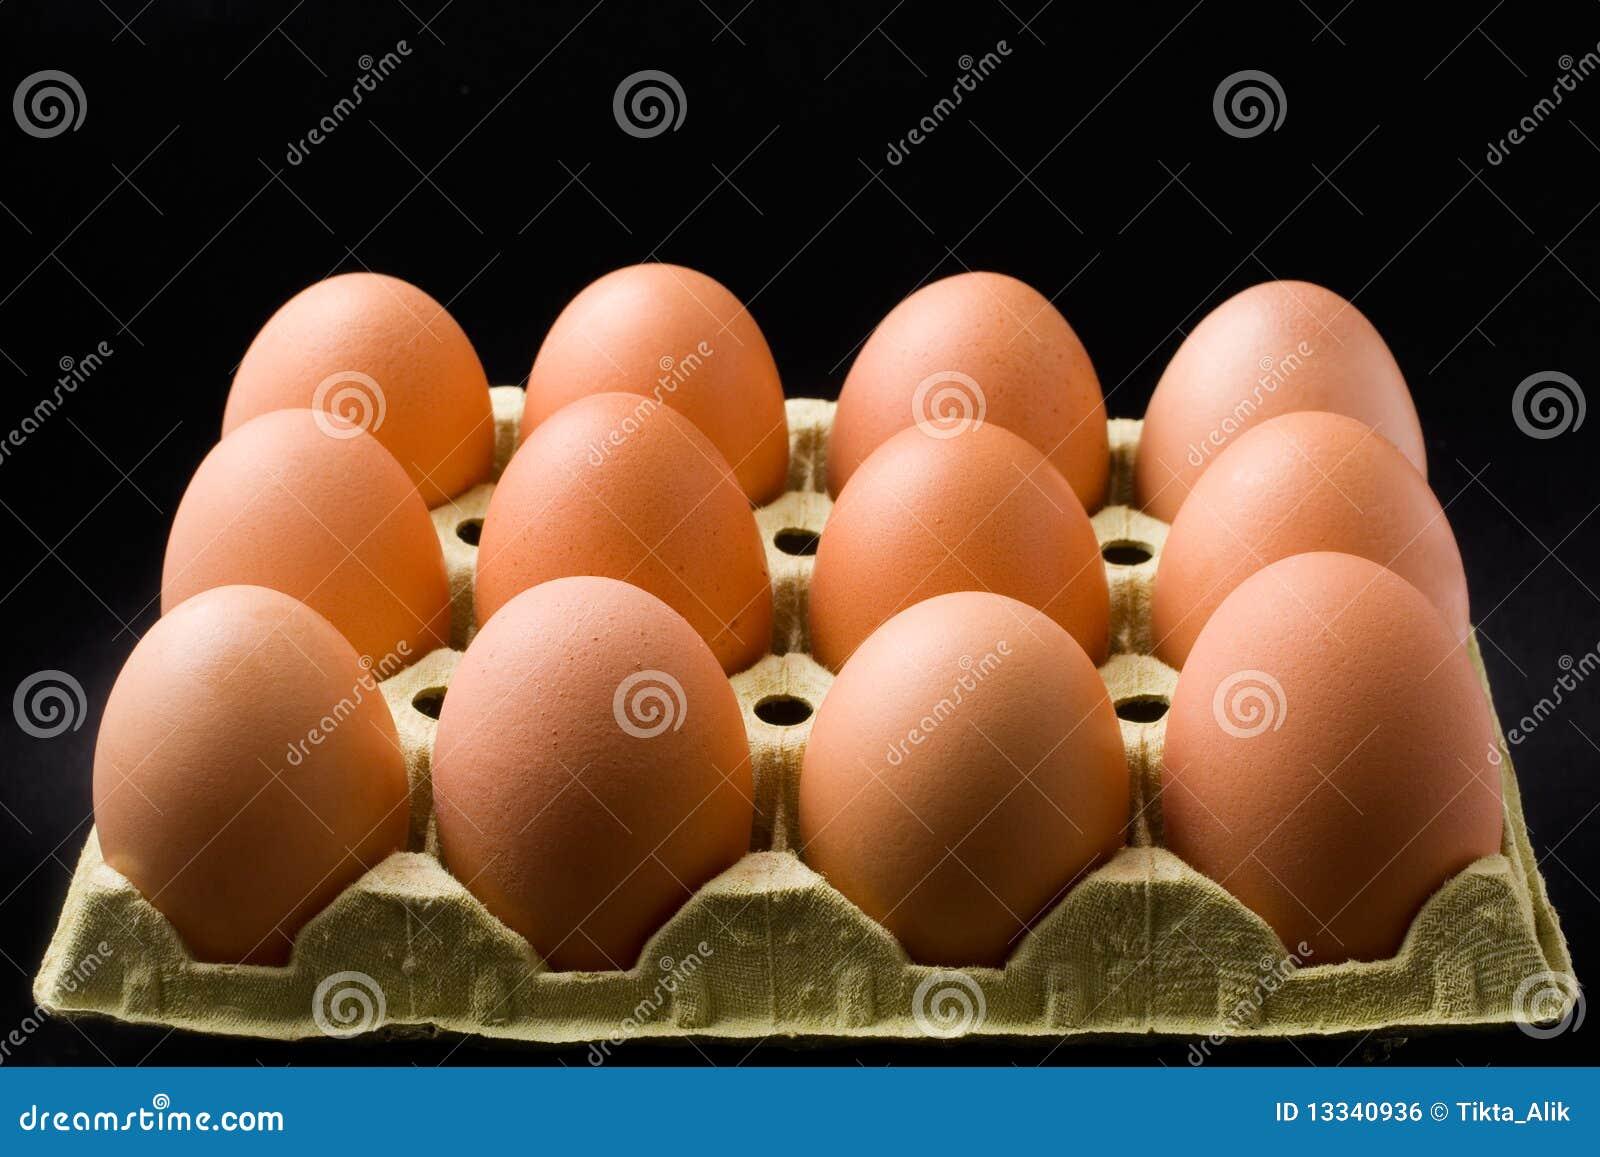 Tuzin jajka